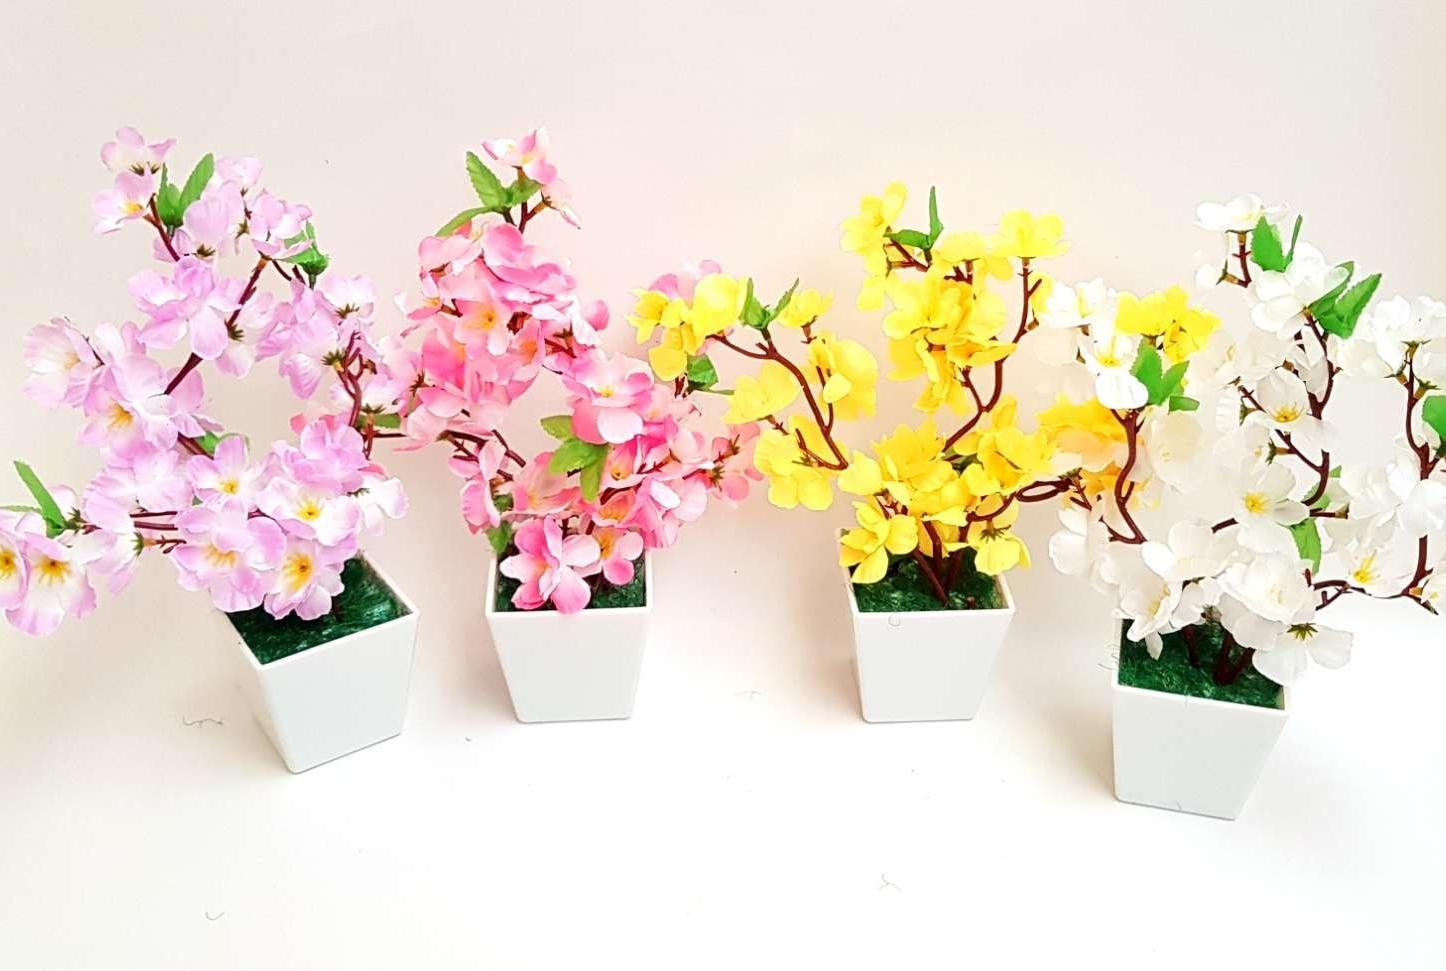 Indonesia. New Sakura dan Vas Kotak Bonsai Unik Dekorasi Meja bdf6e7e9e7